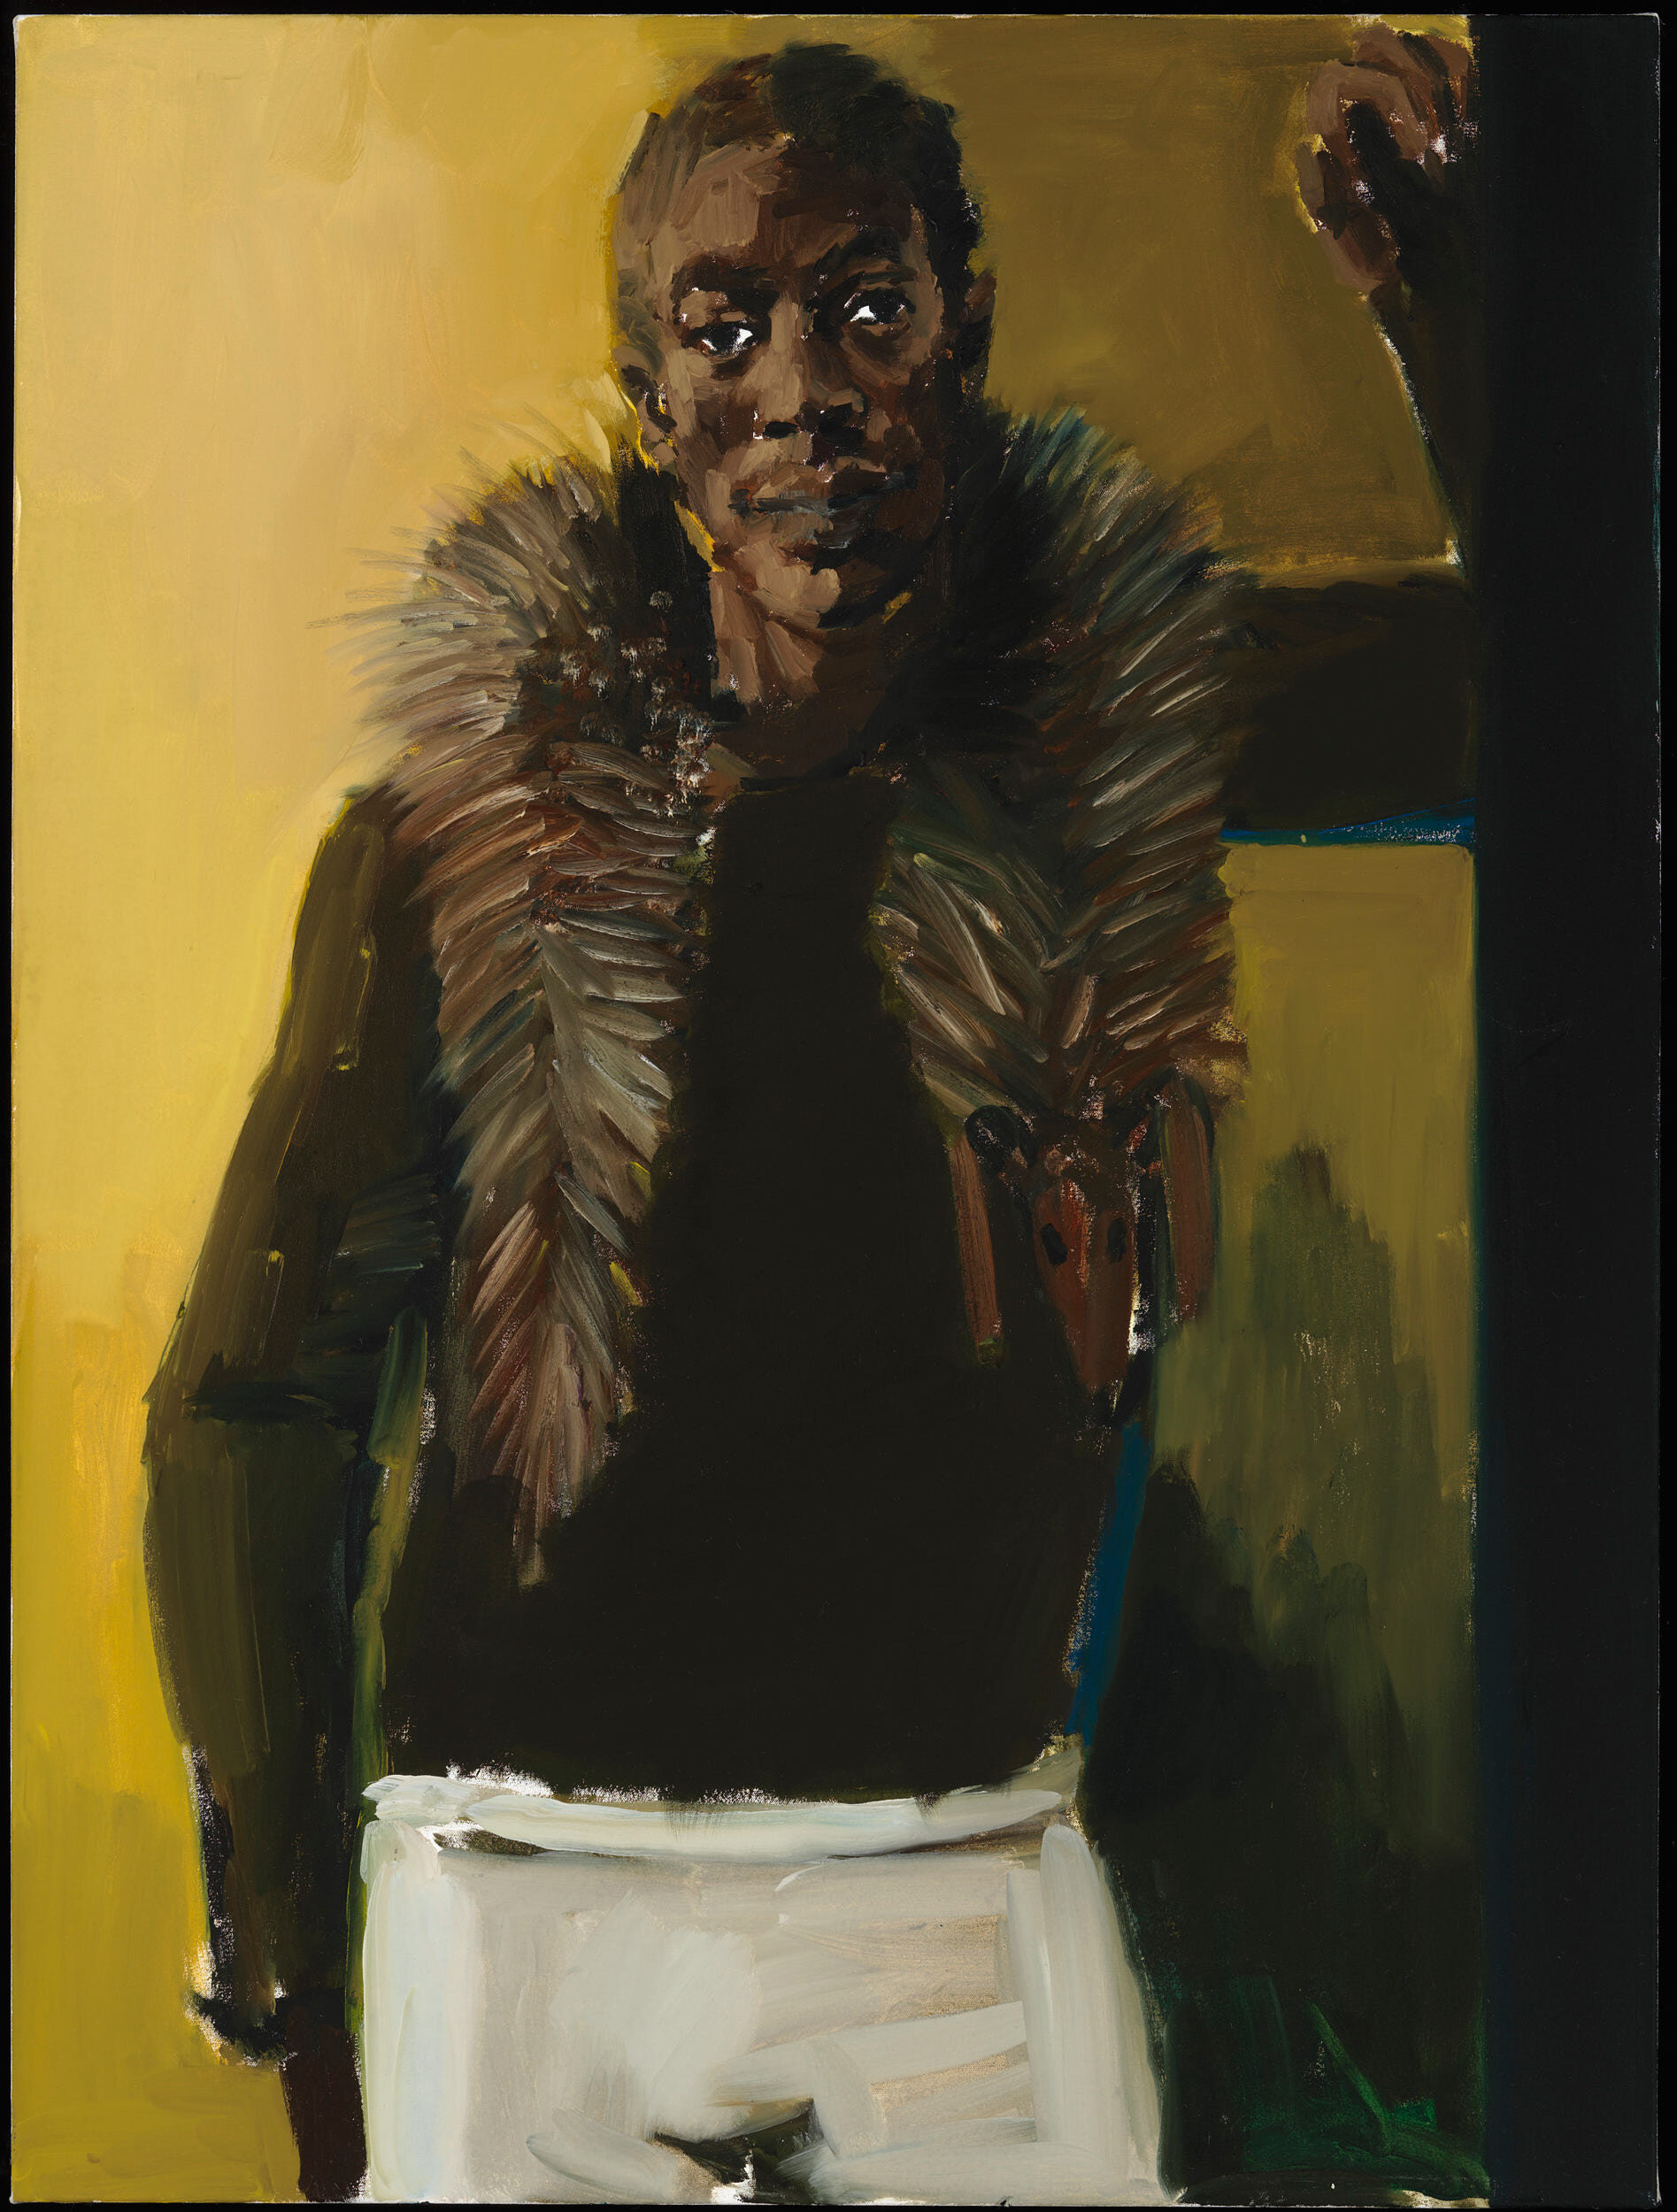 Image Courtesy of The Artist, Corvi-Mora, London and Jack Shainman Gallery, New York